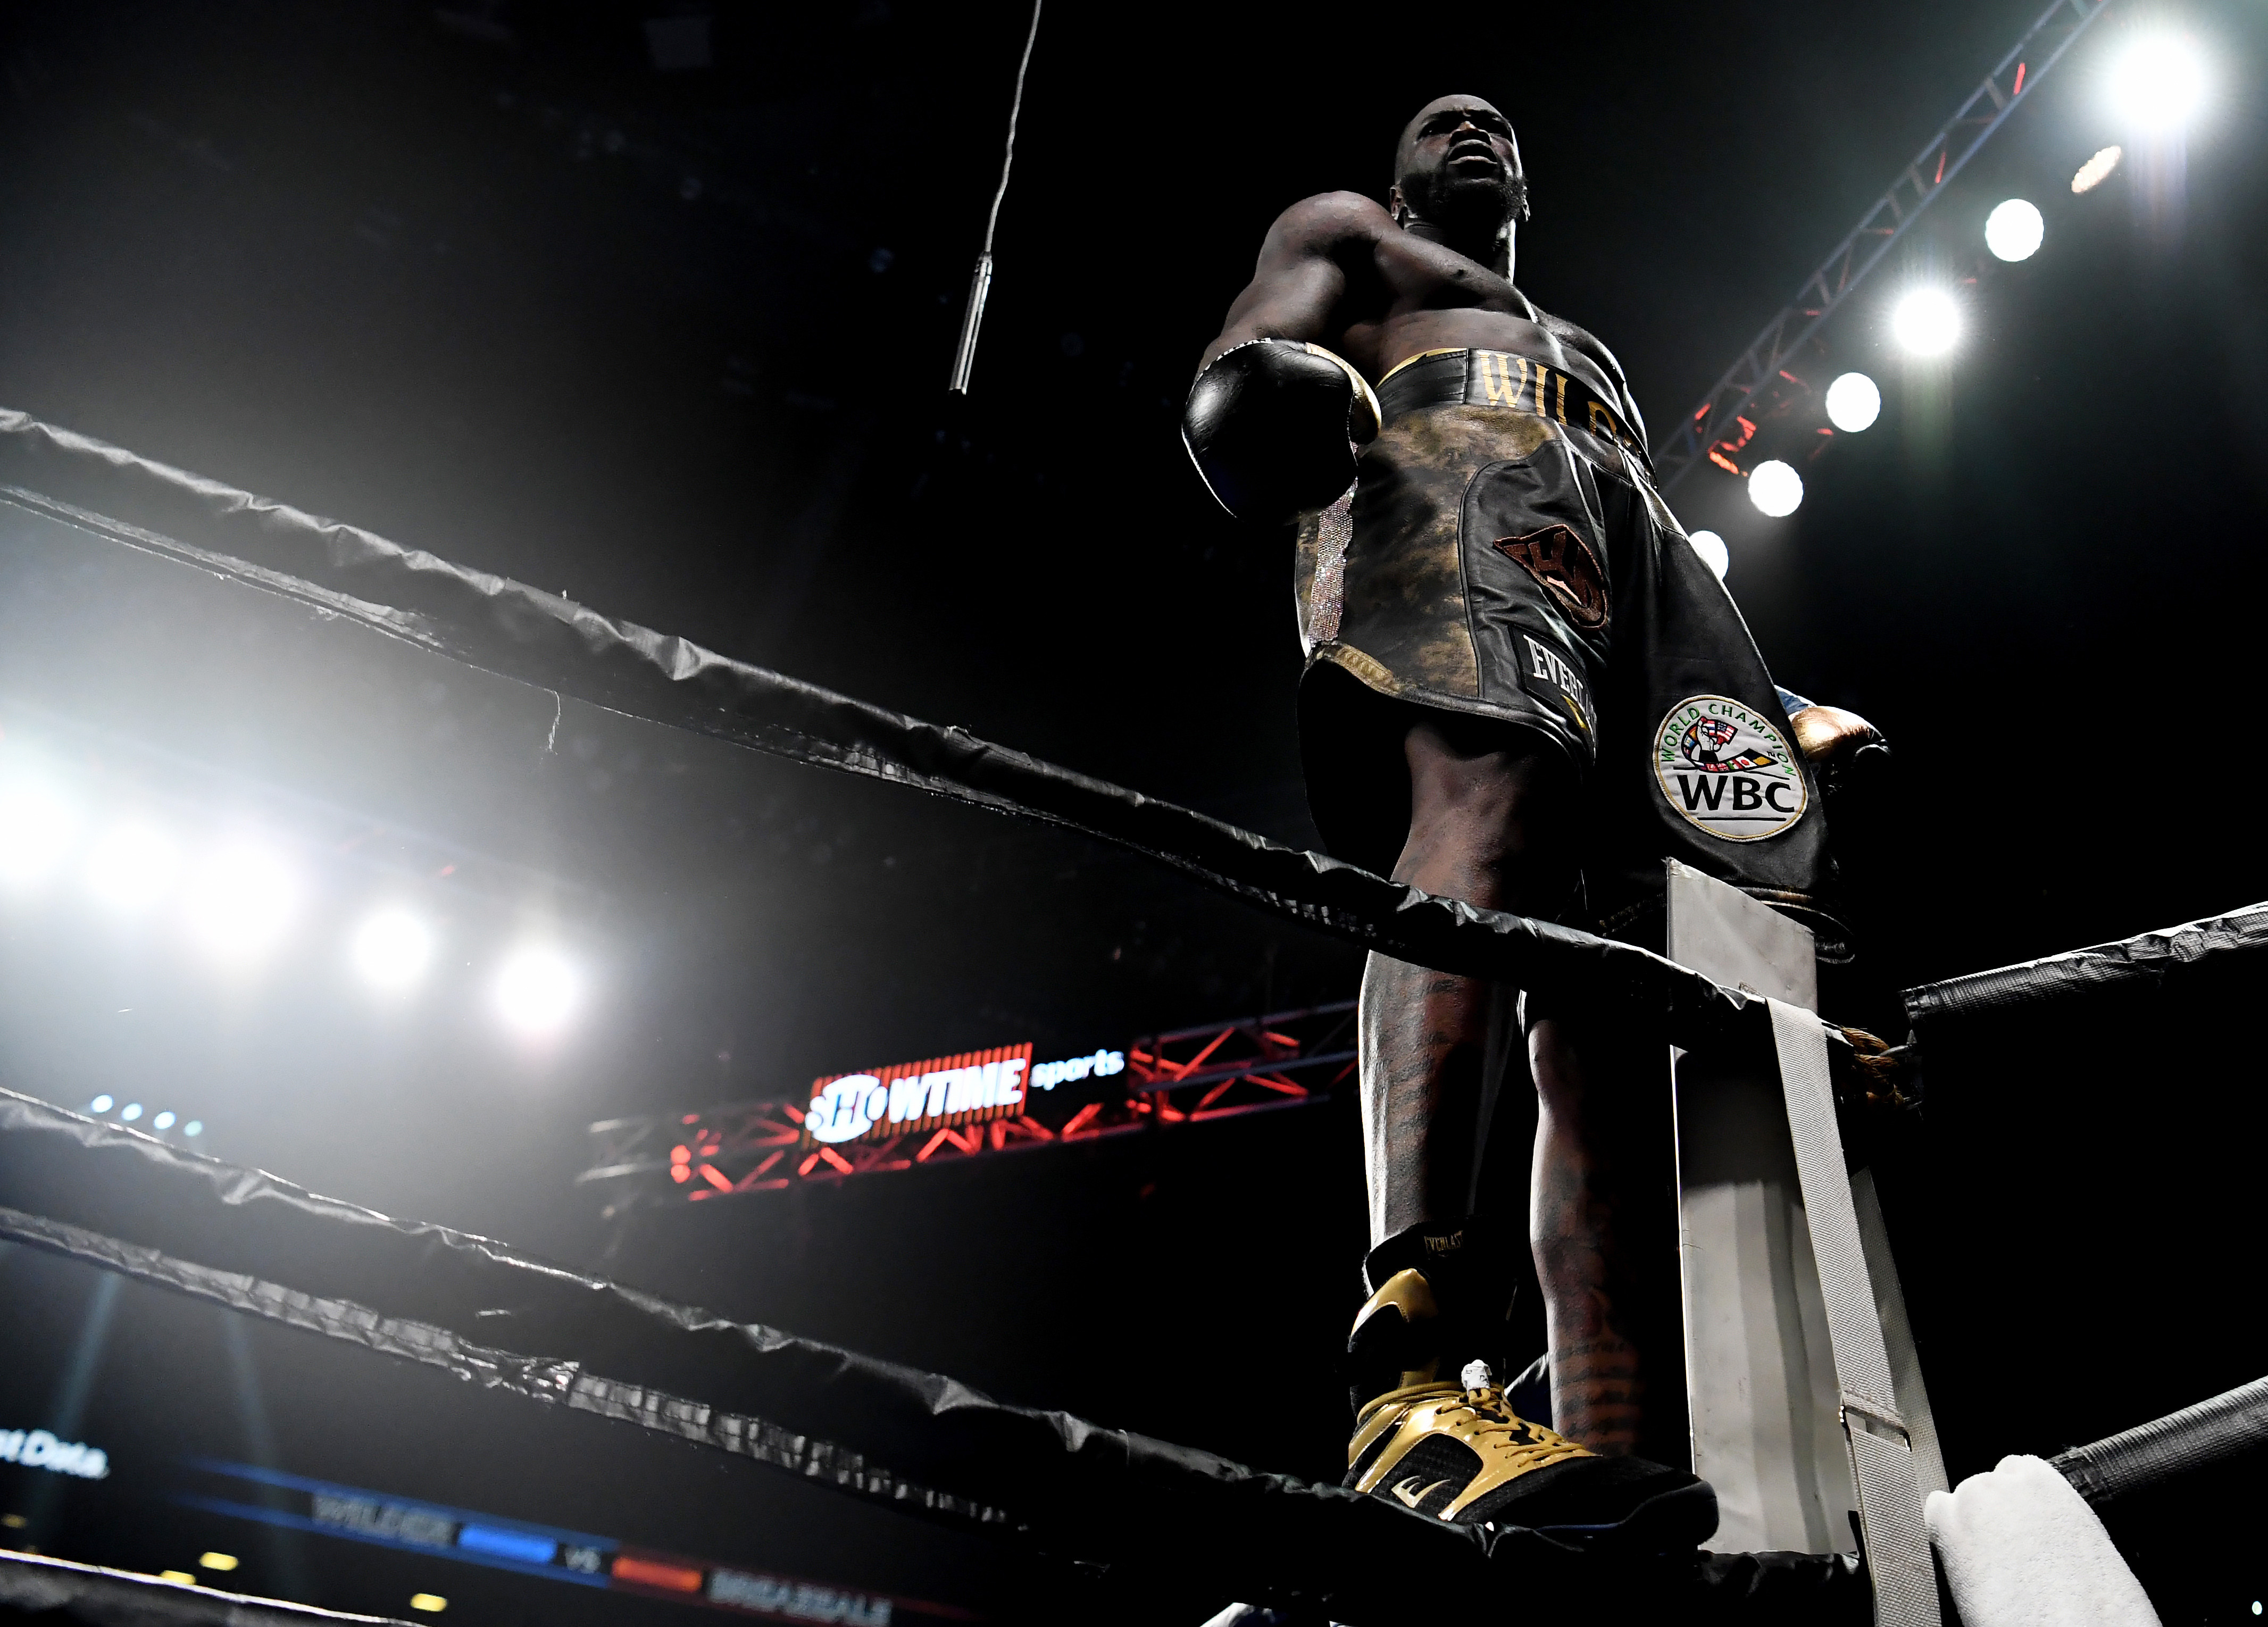 Tyson Fury challenges Deontay Wilder in rematch